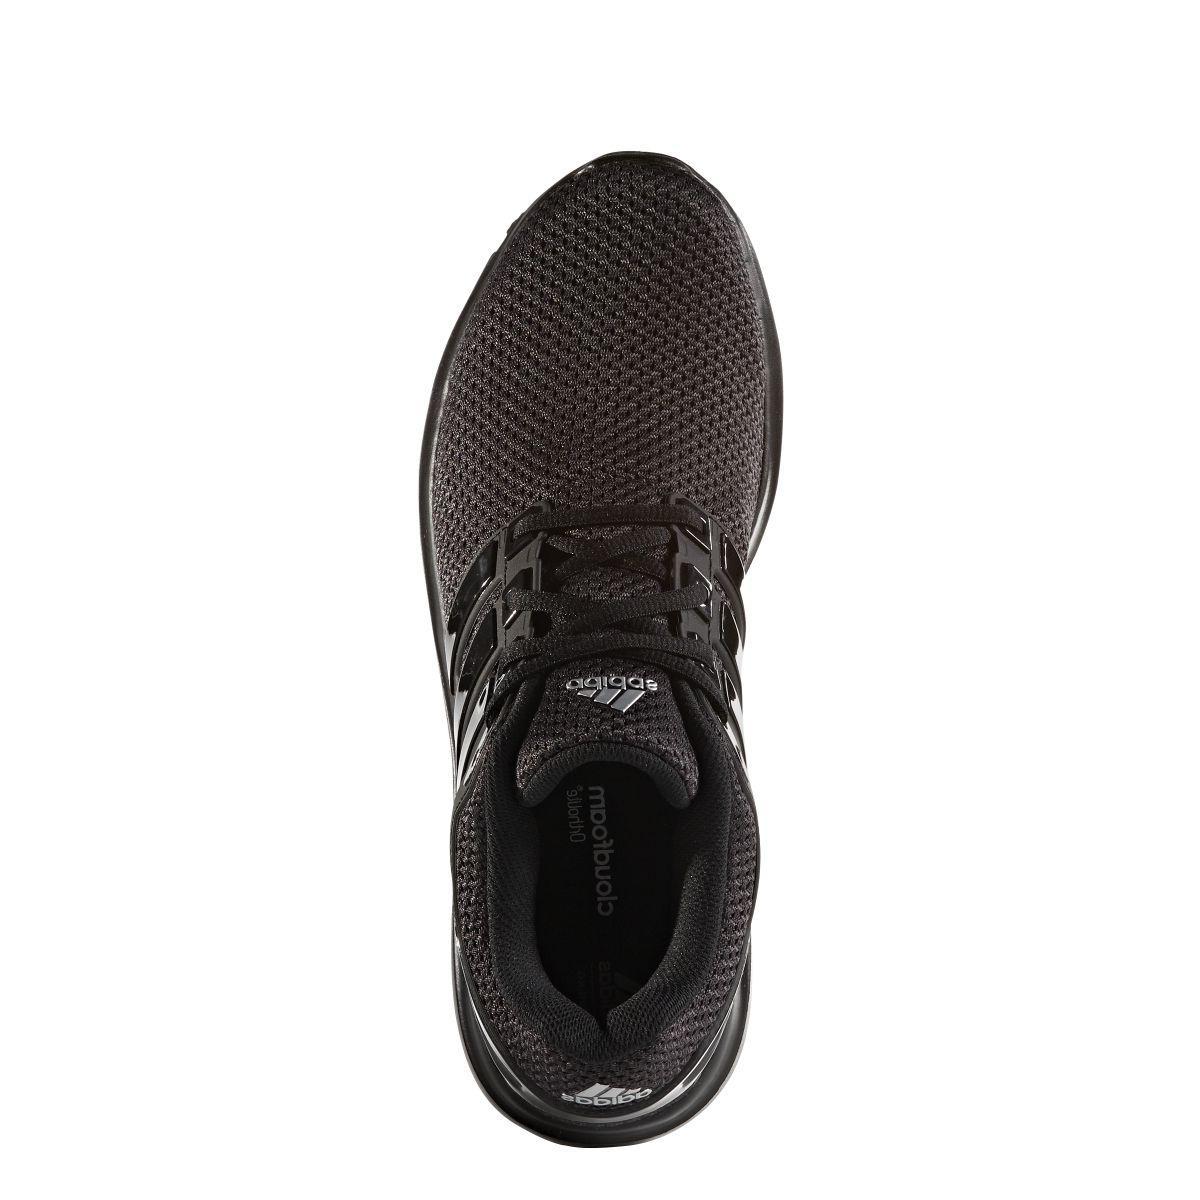 Sport Shoes S81023 Size 8,14